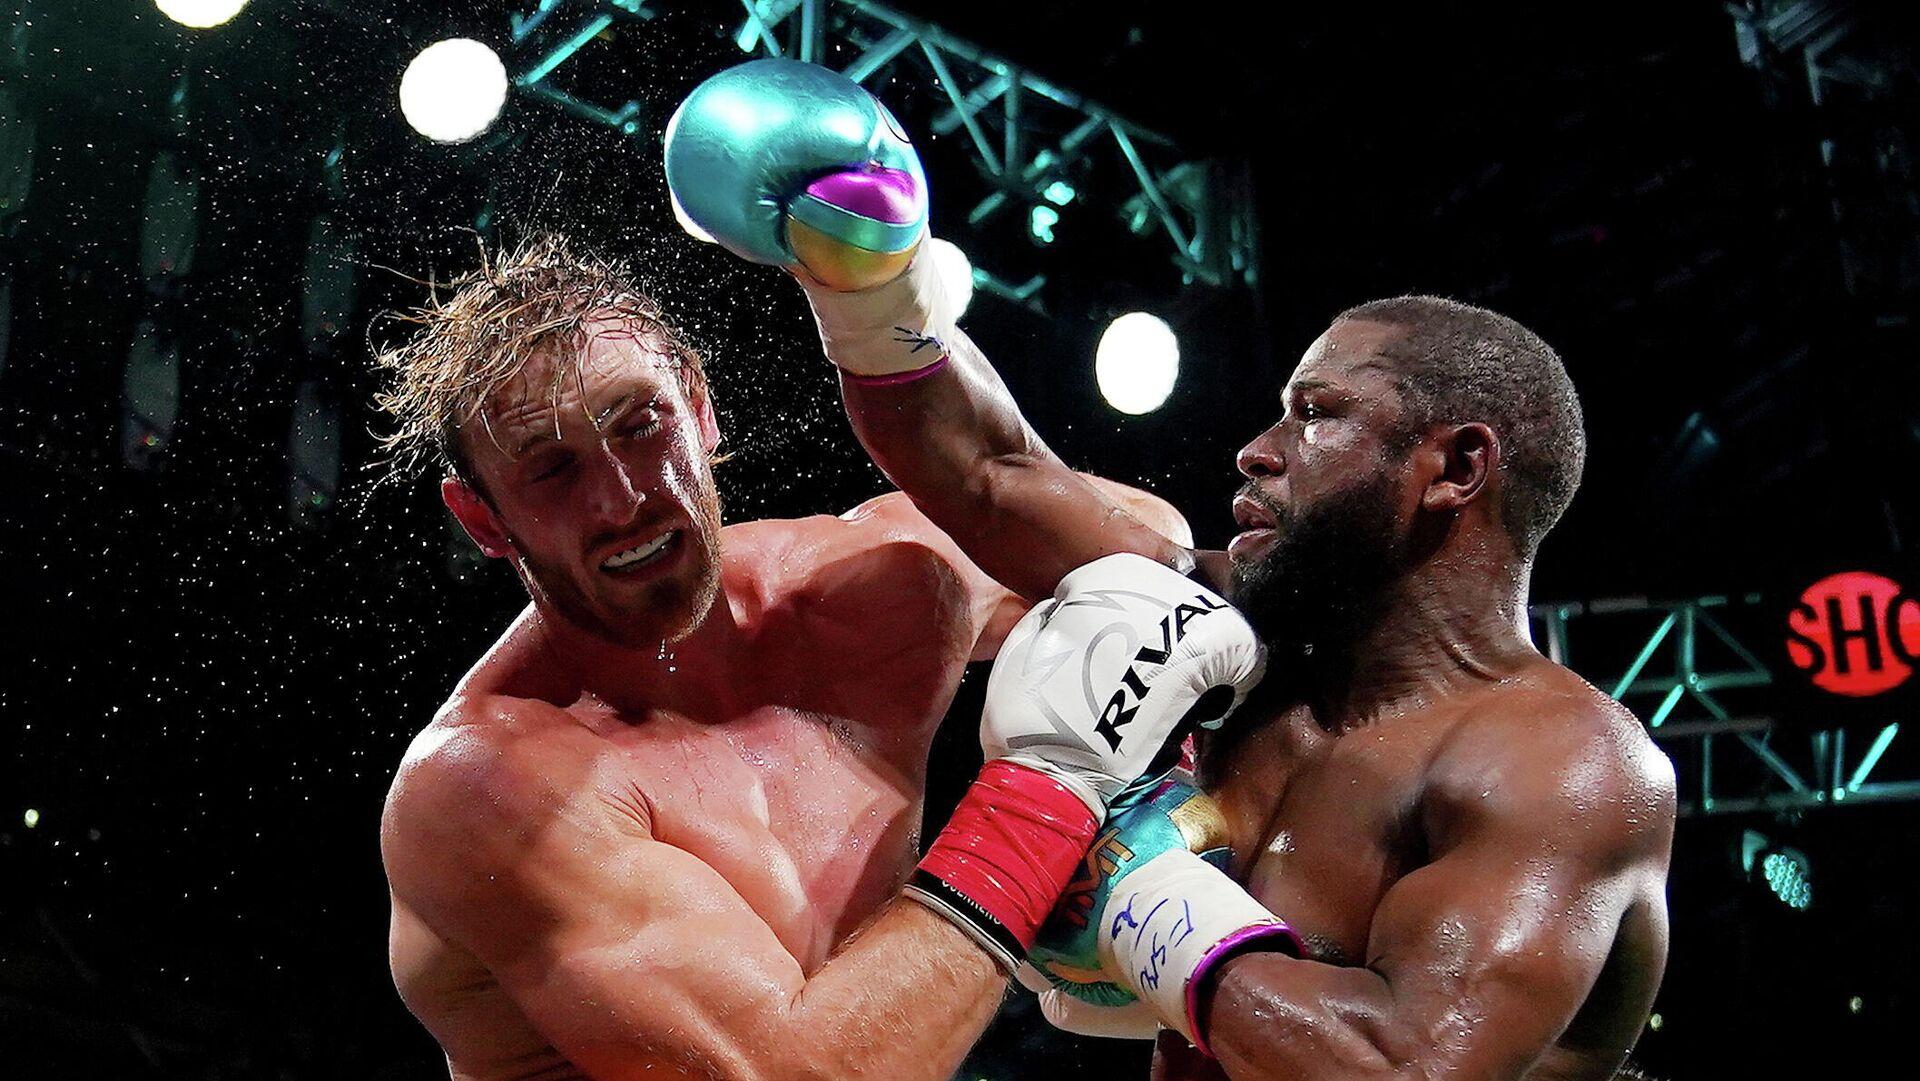 La pelea entre Logan Paul y Floyd Mayweather Jr. - Sputnik Mundo, 1920, 07.06.2021